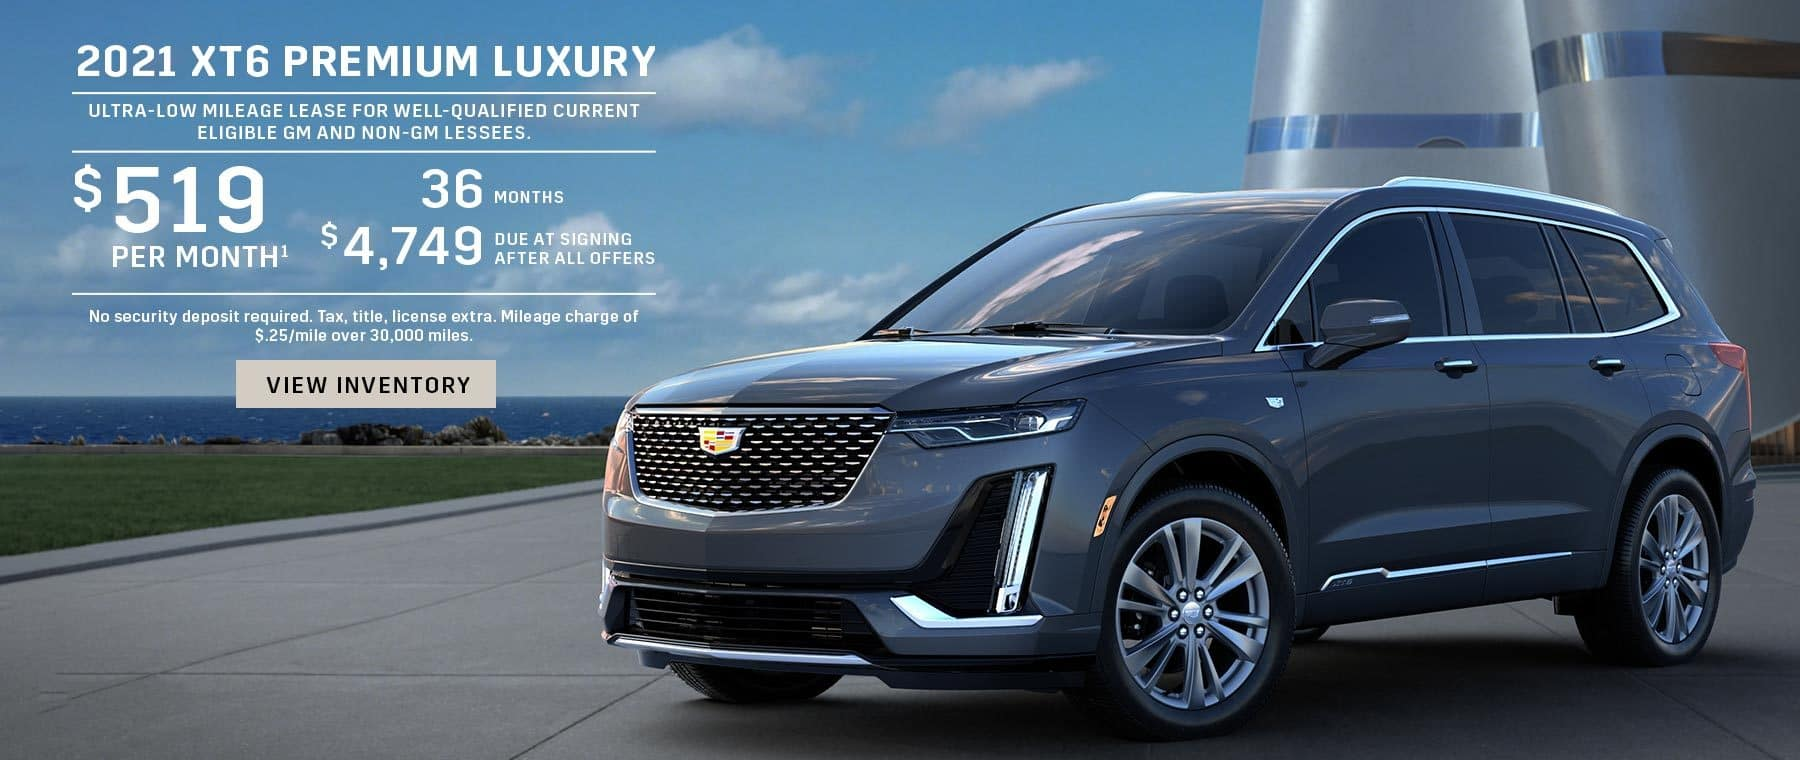 2021 Cadillac XT6 offer